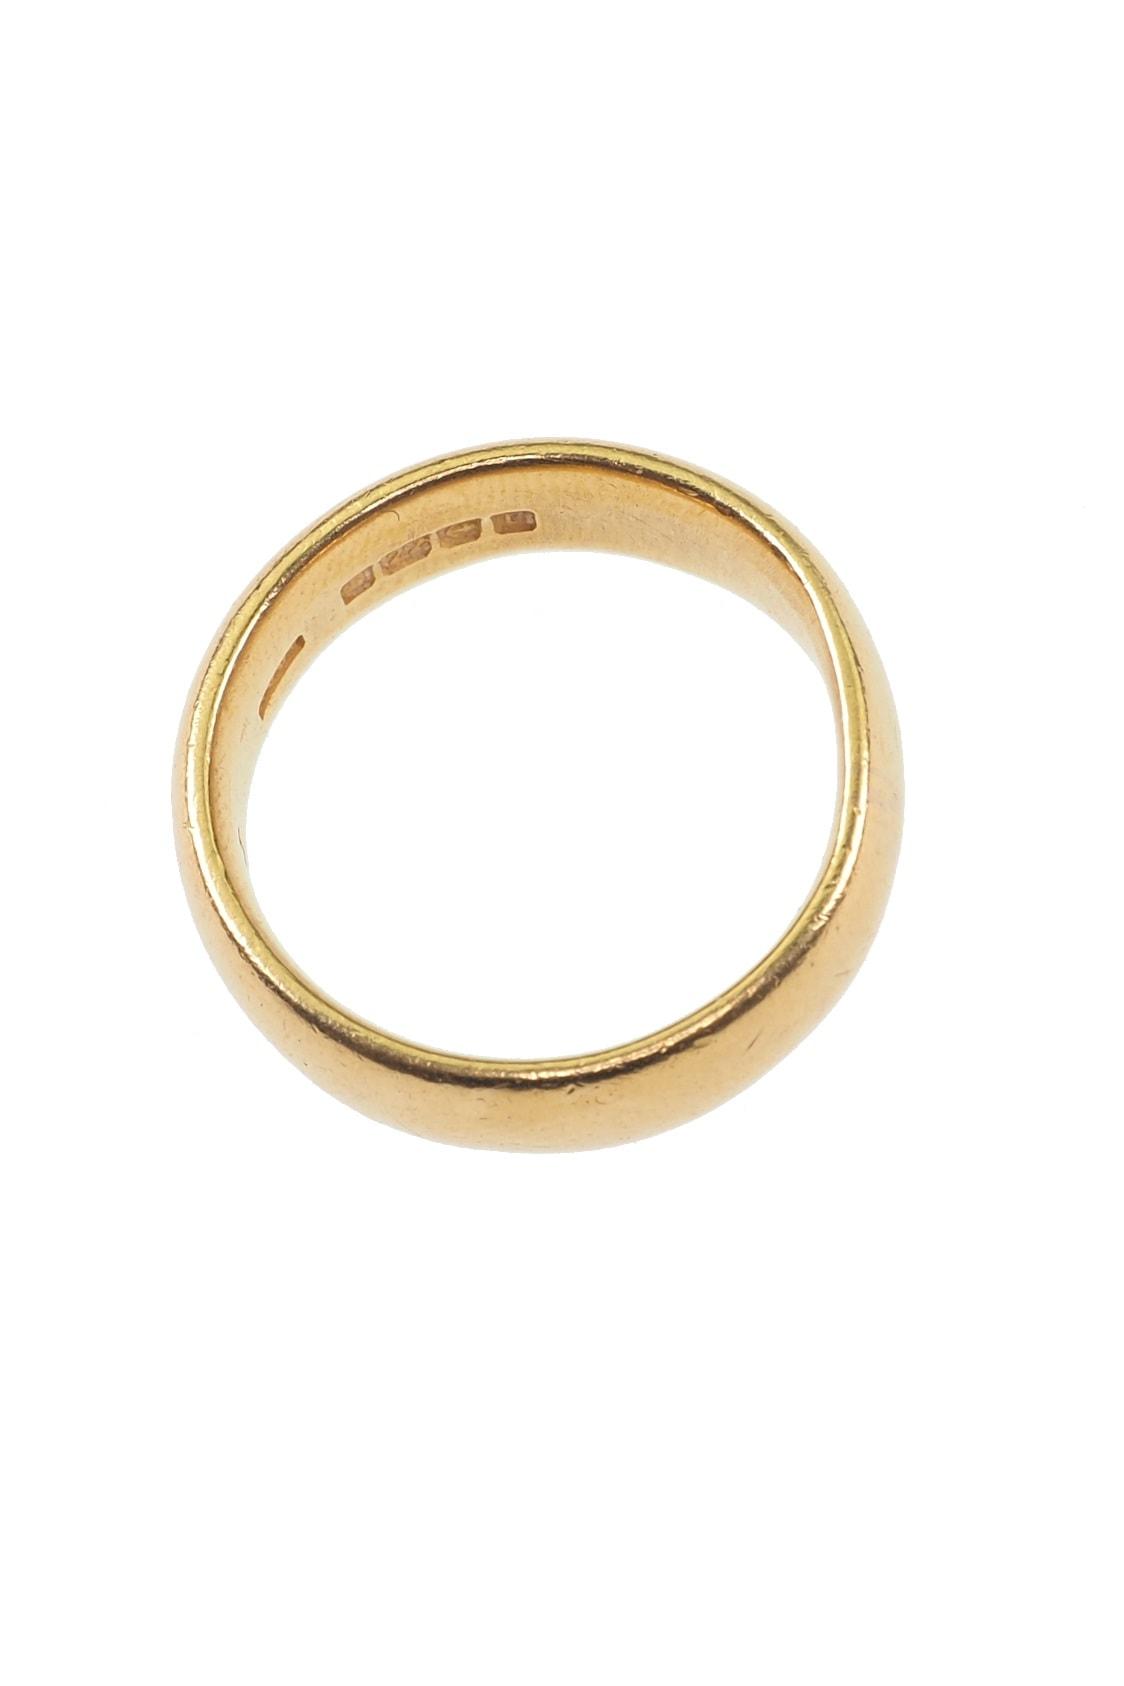 antike-Goldeheringe-kaufen-0494b